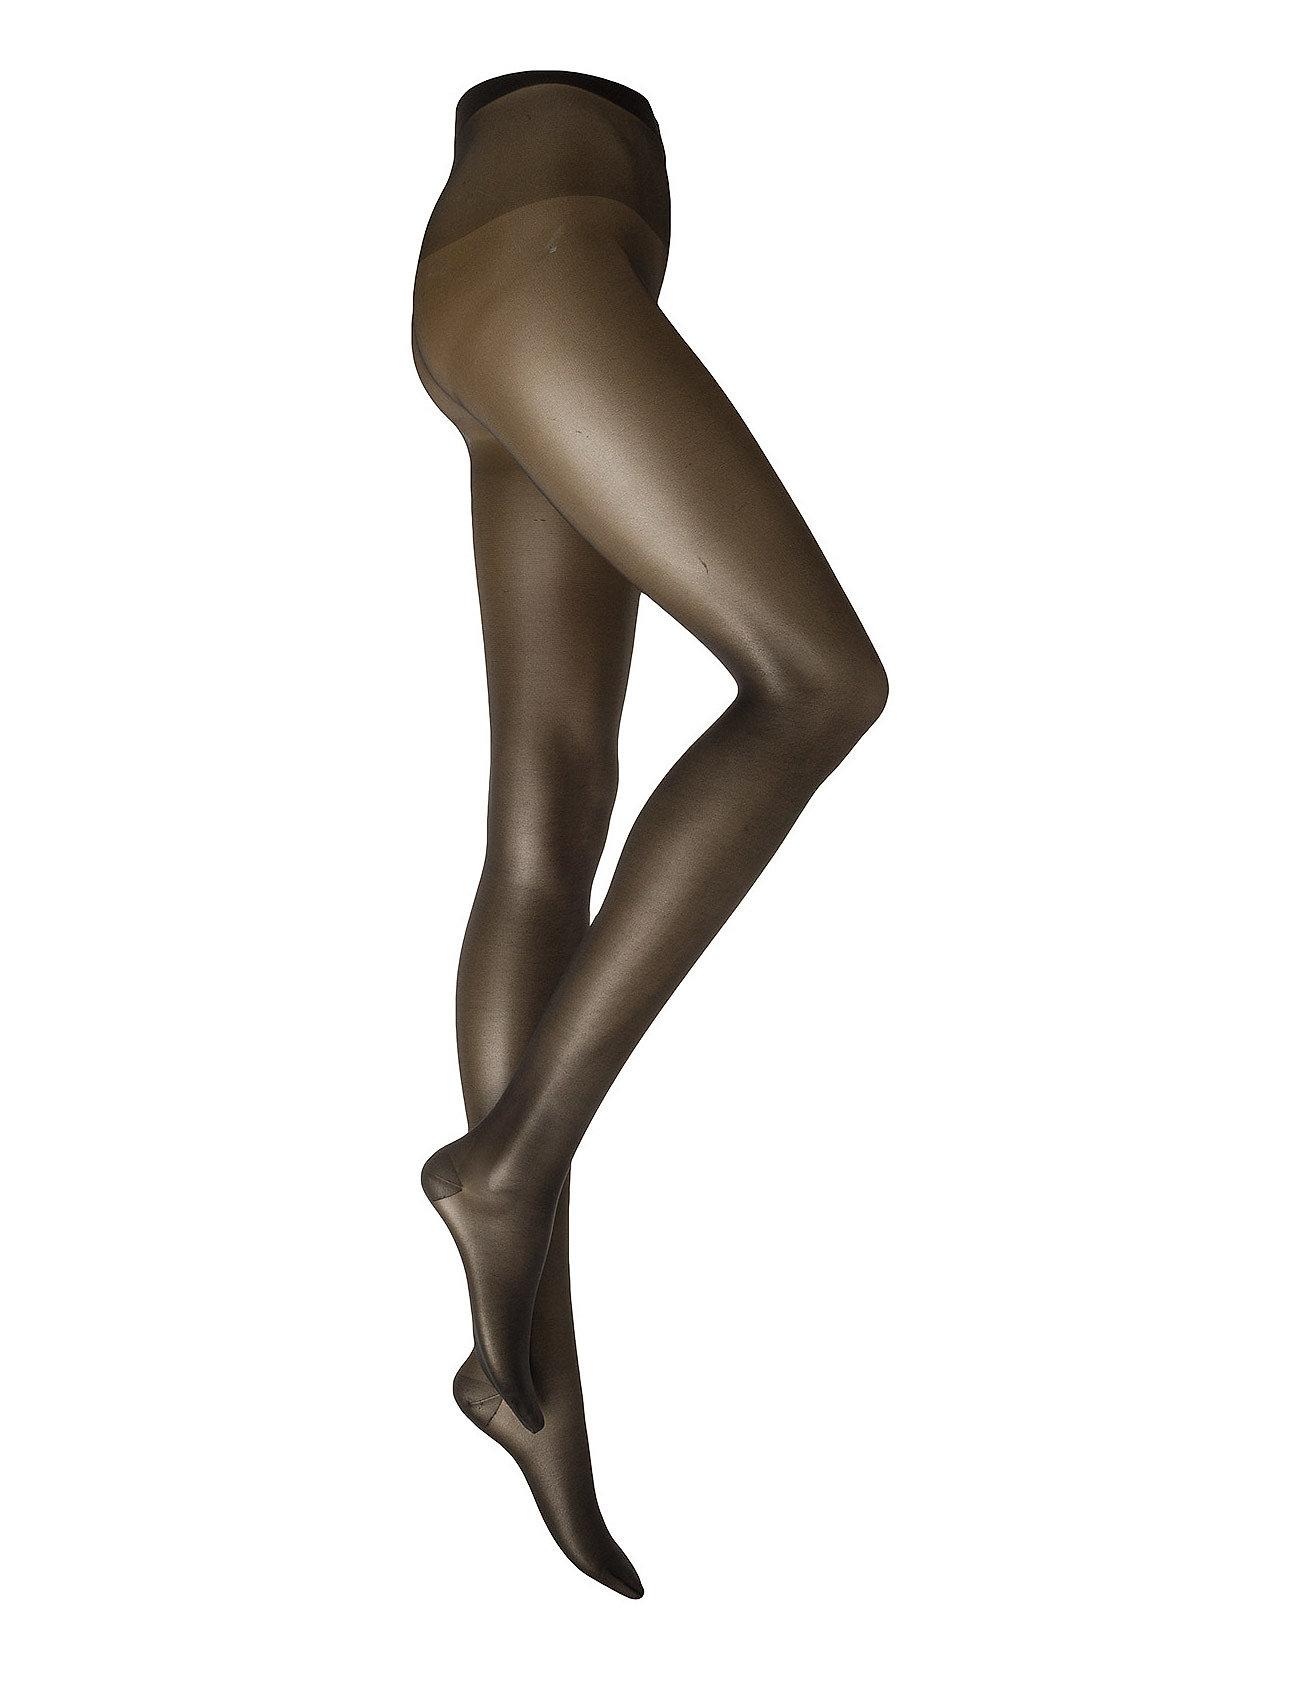 Image of Pure Energy 30 Leg Vitalizer Strømpebukser Sort Wolford (3007913107)